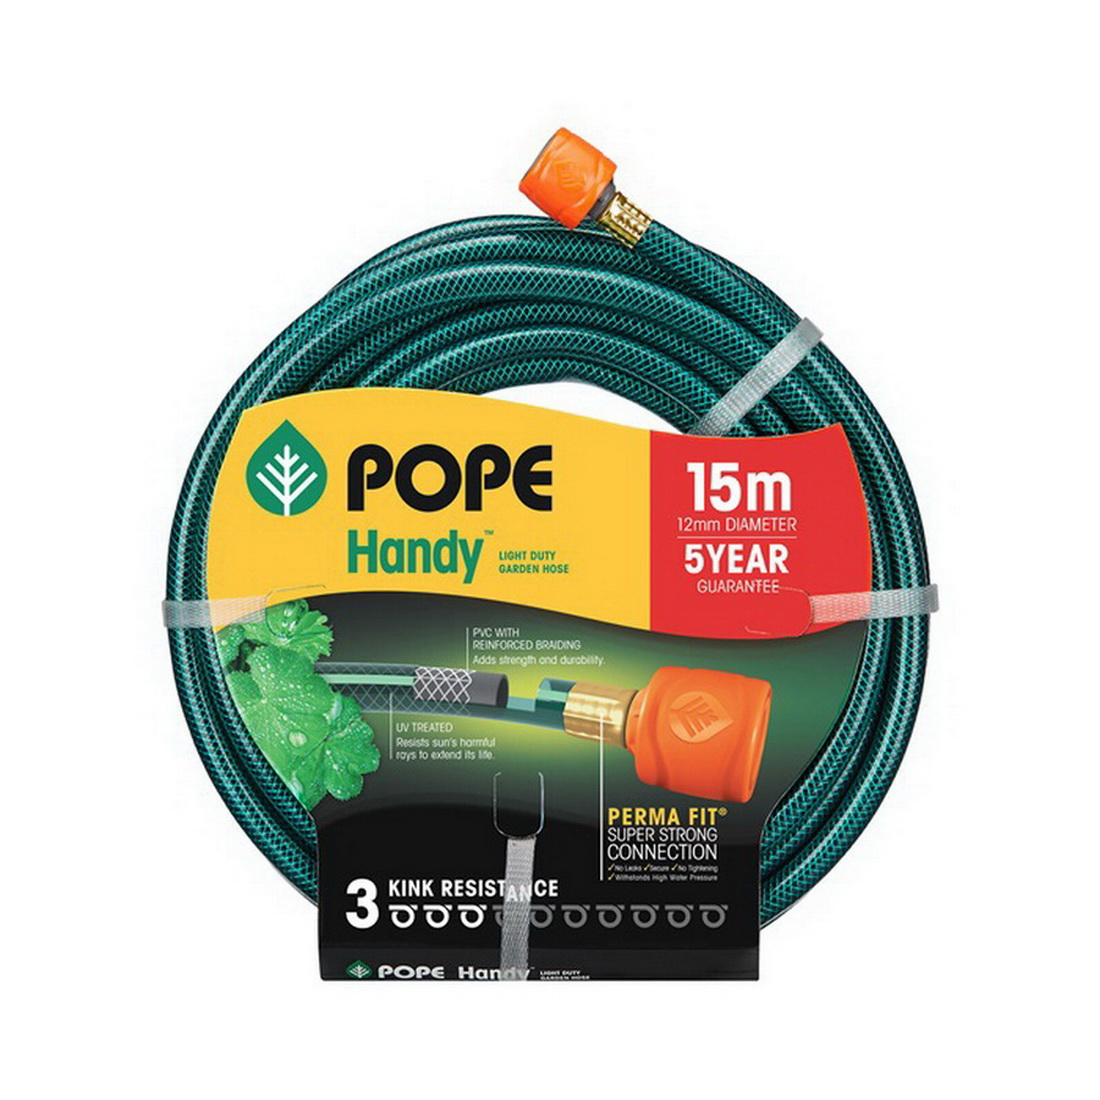 Handy Tap Ready Fitted Garden Hose 12mm Diameter x 15m